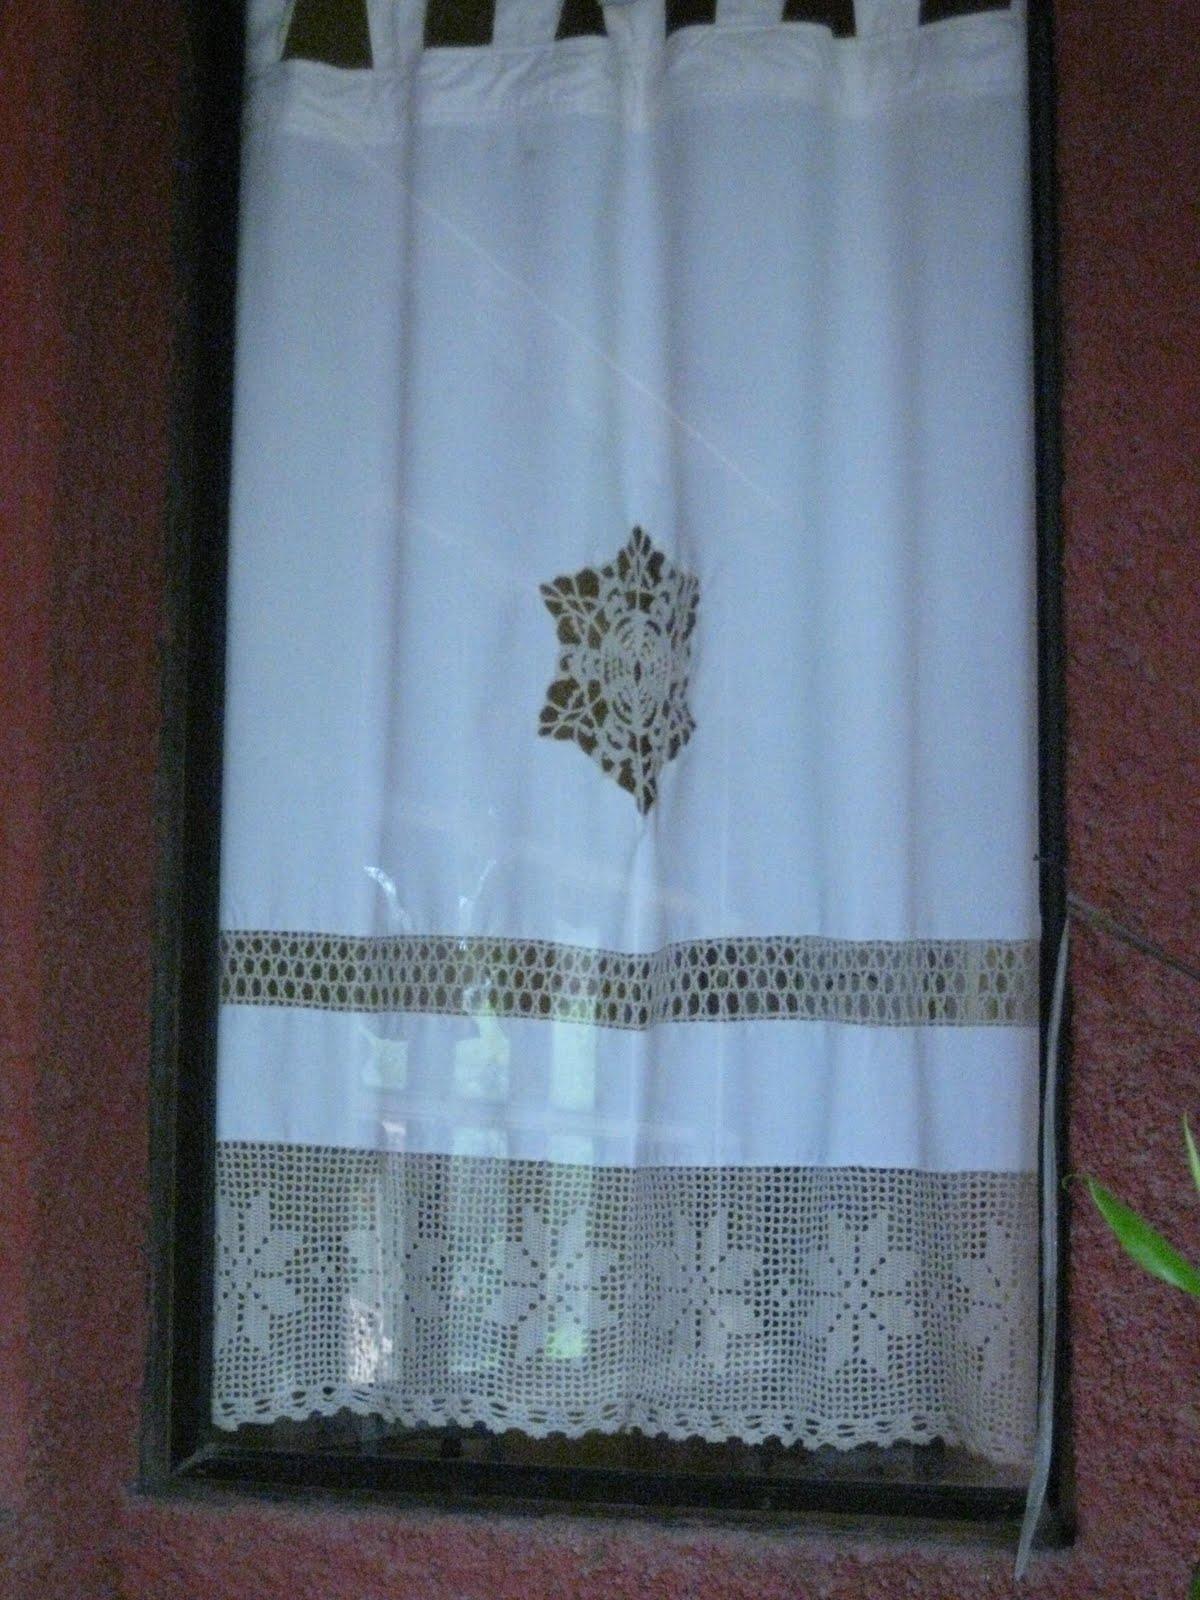 Mar a elena en lonqu n una cortina peque a a small curtain - Apliques para cortinas ...